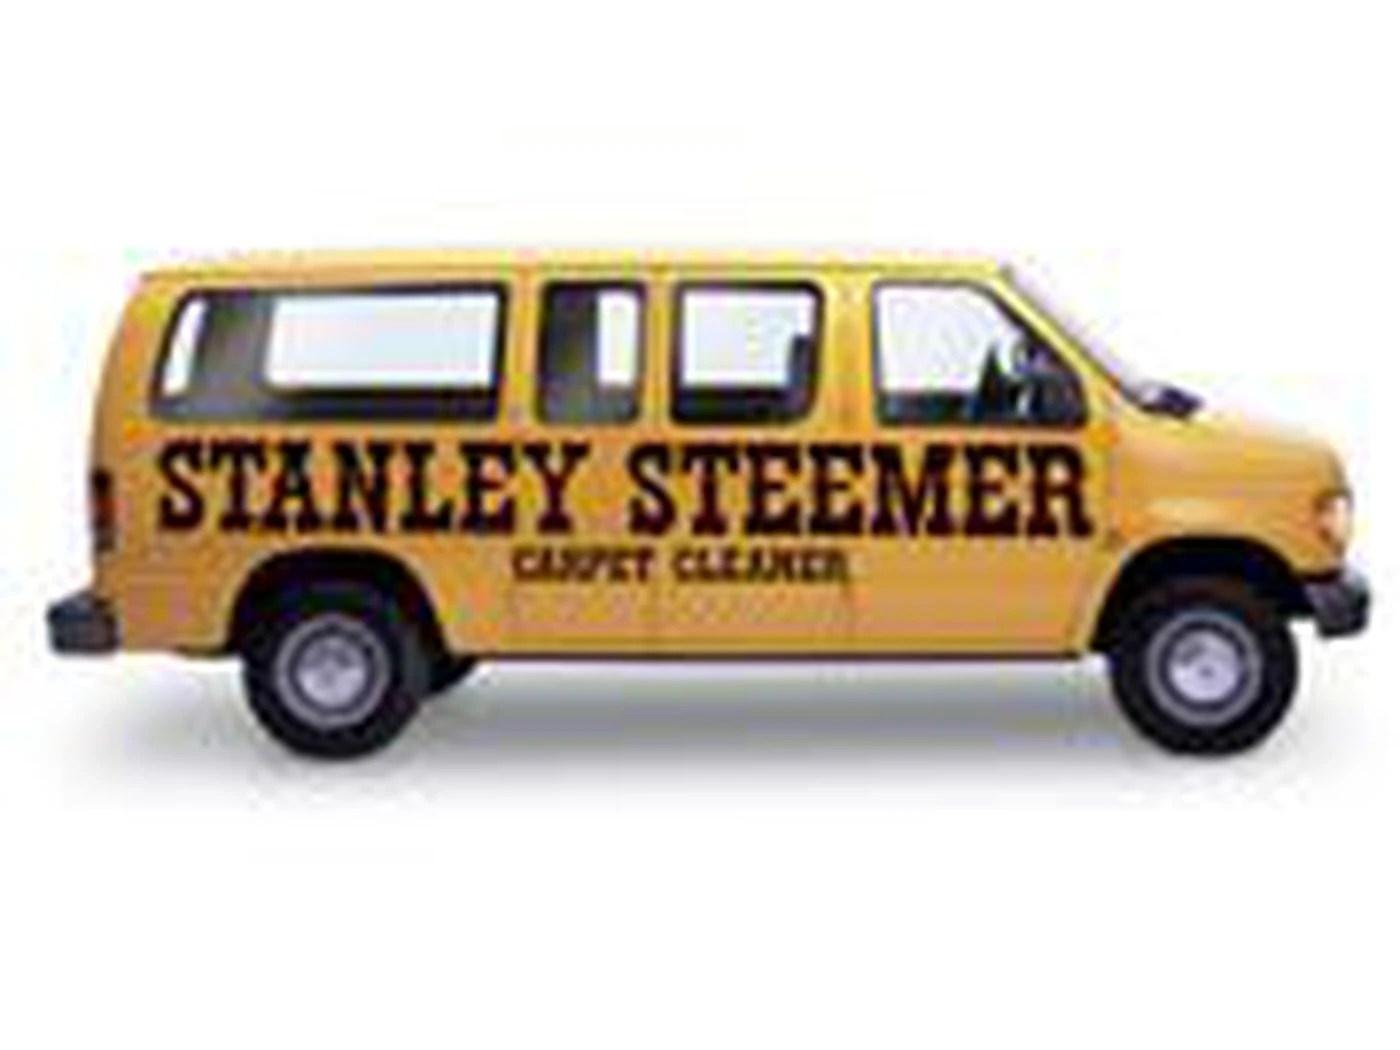 stanley steemer celebrates national